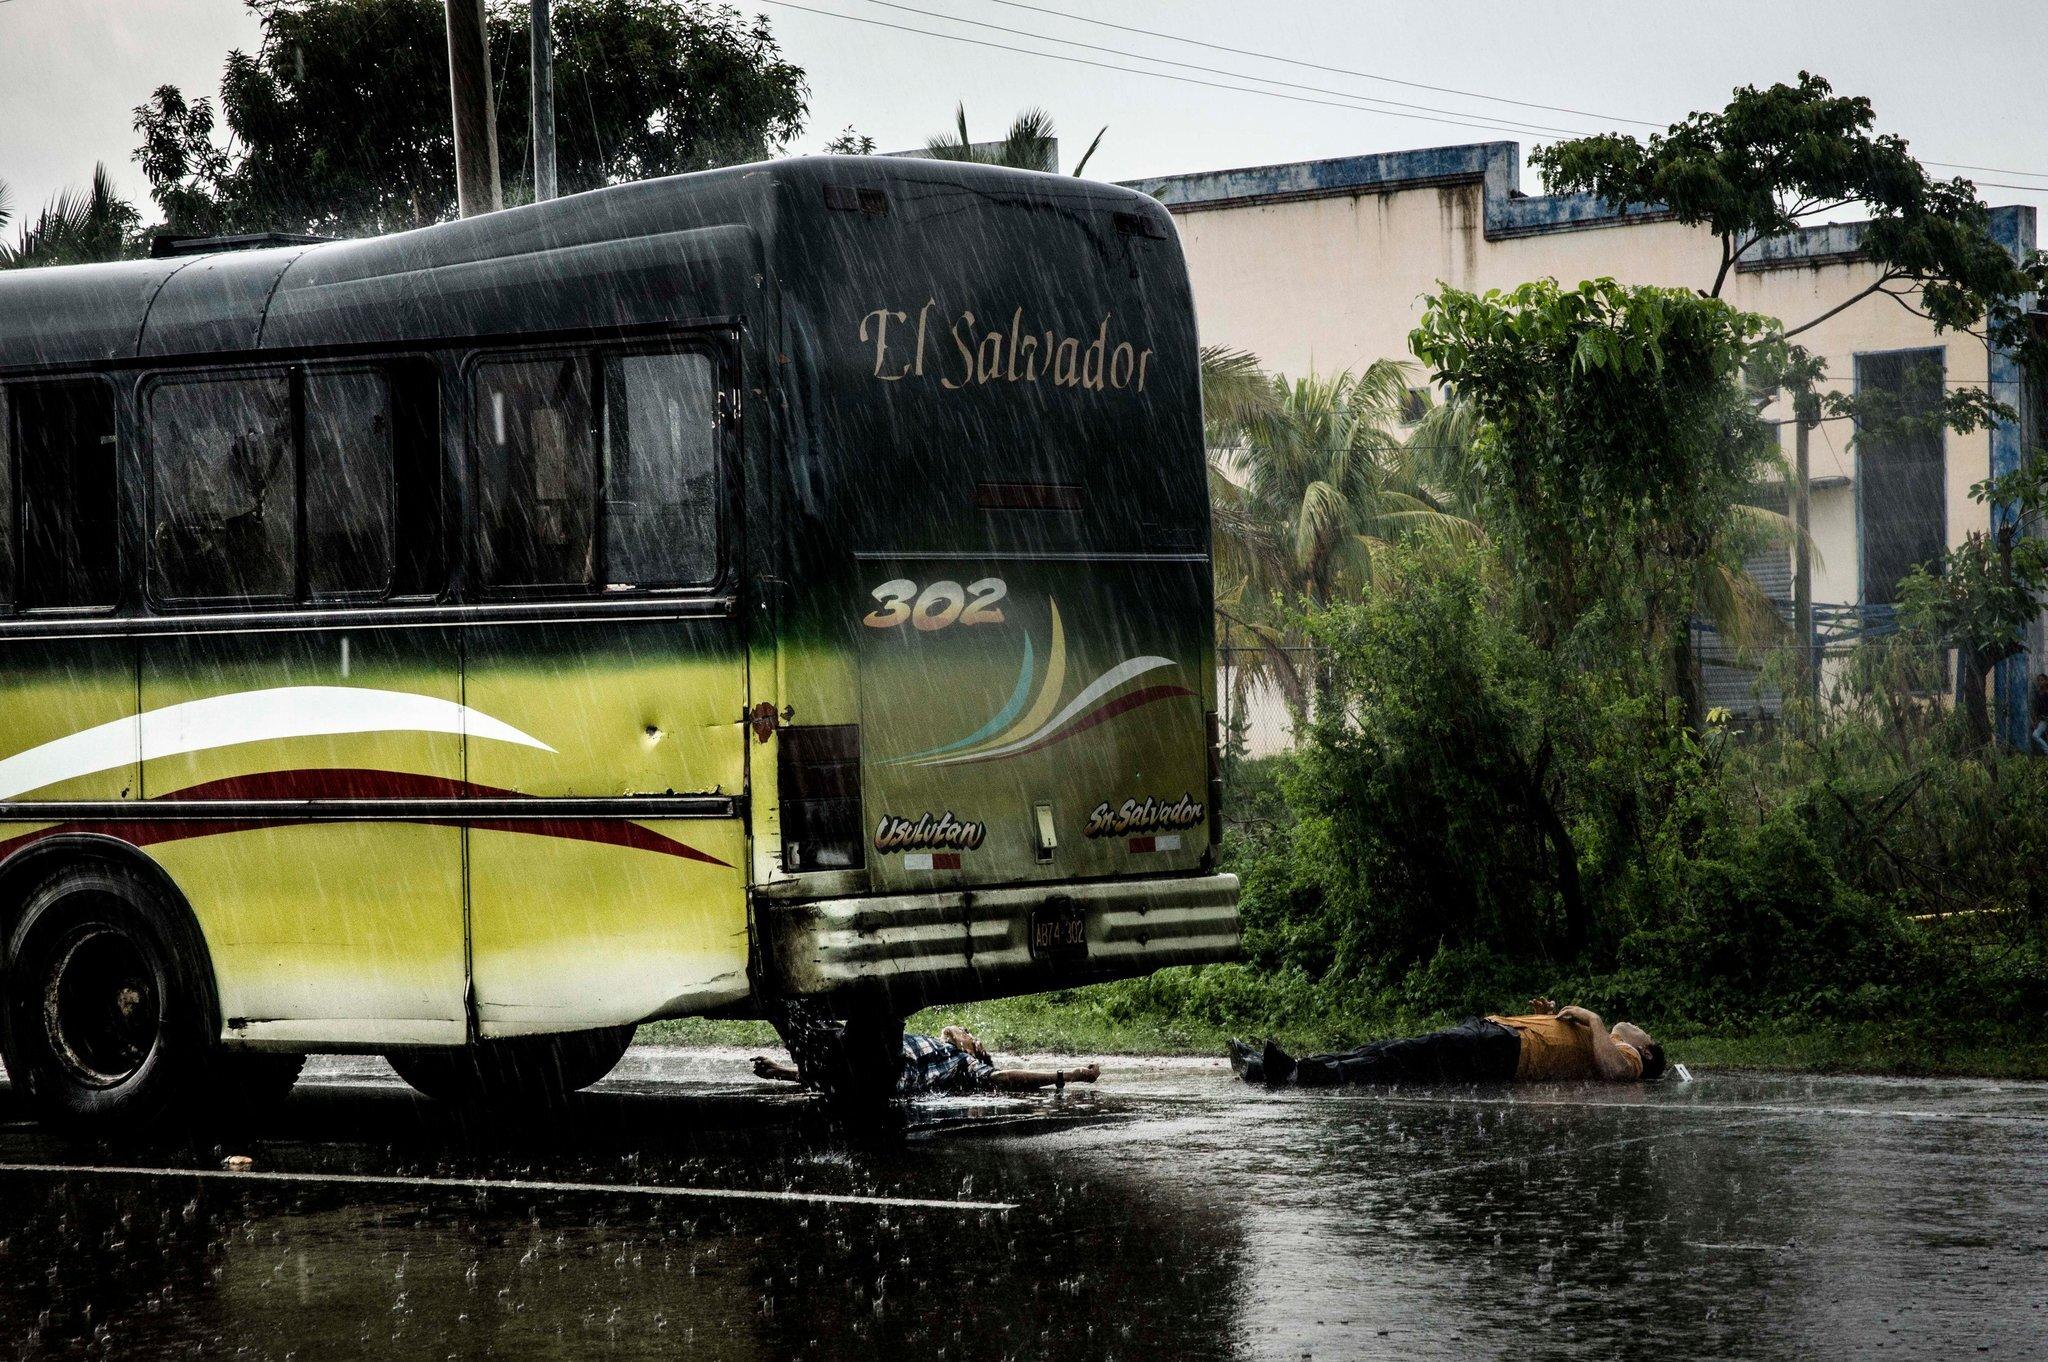 Killers on a Shoestring: Inside the Gangs of El Salvador